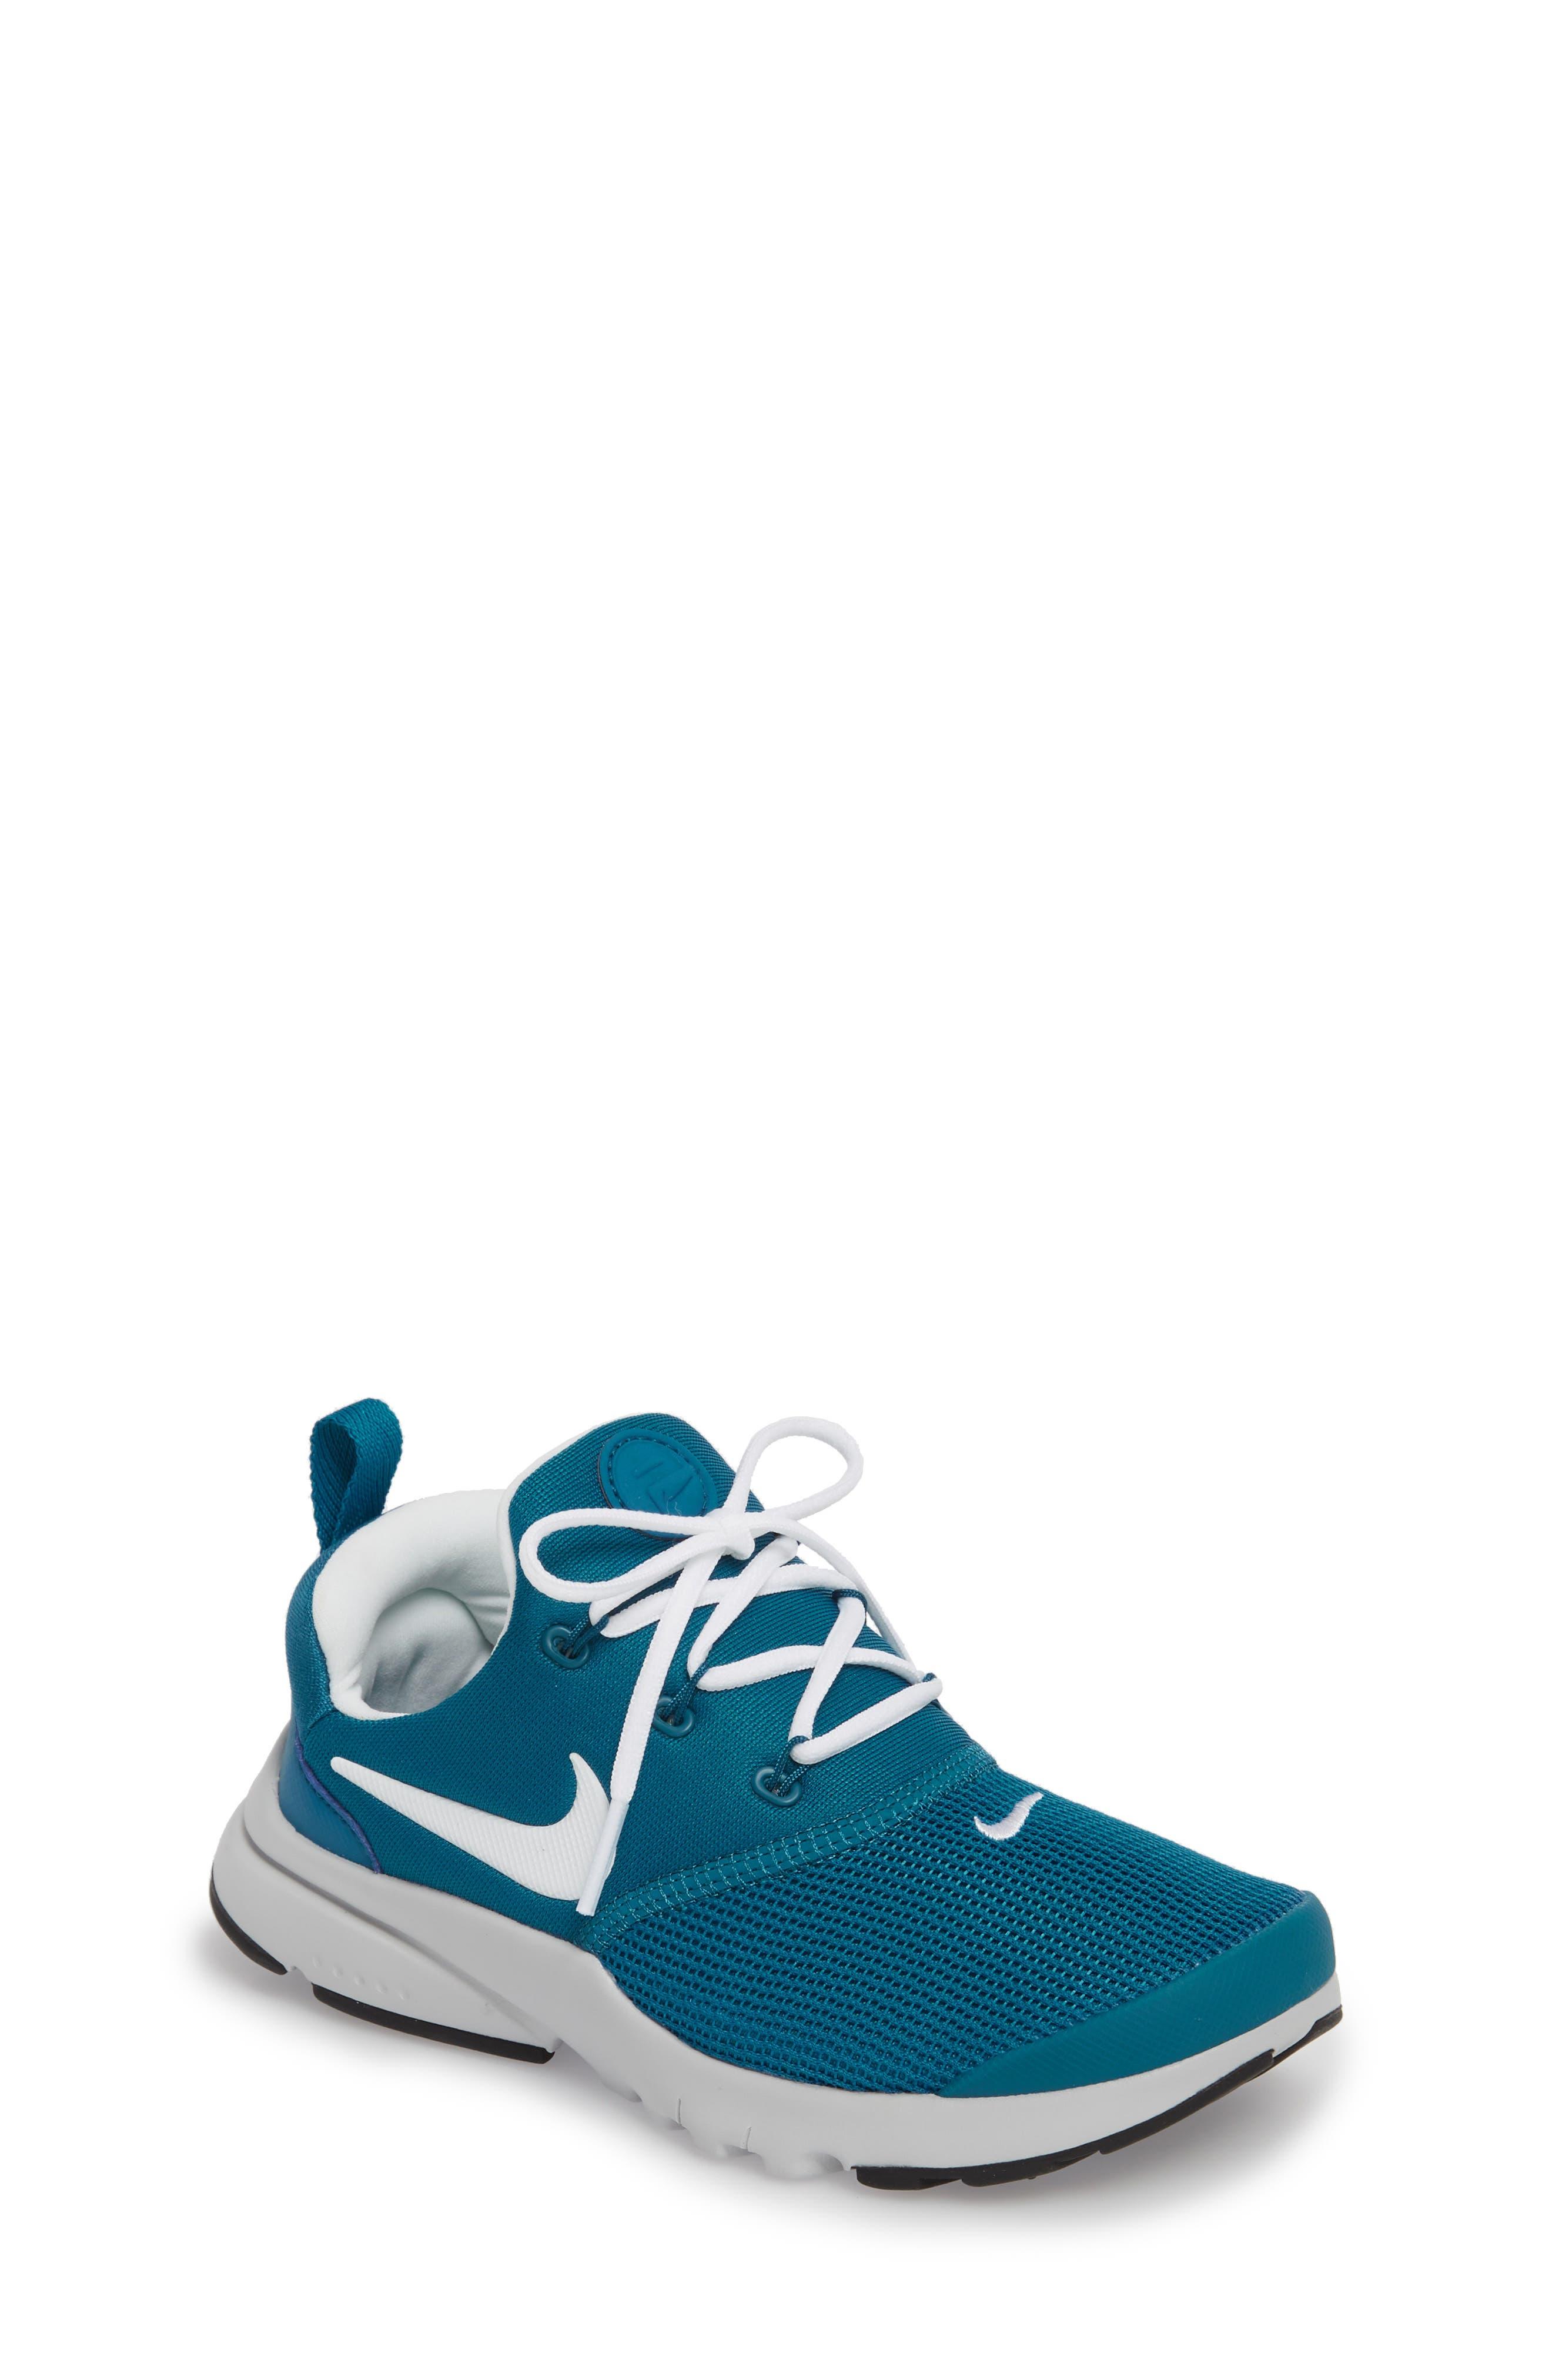 Presto Fly Sneaker,                         Main,                         color, 440